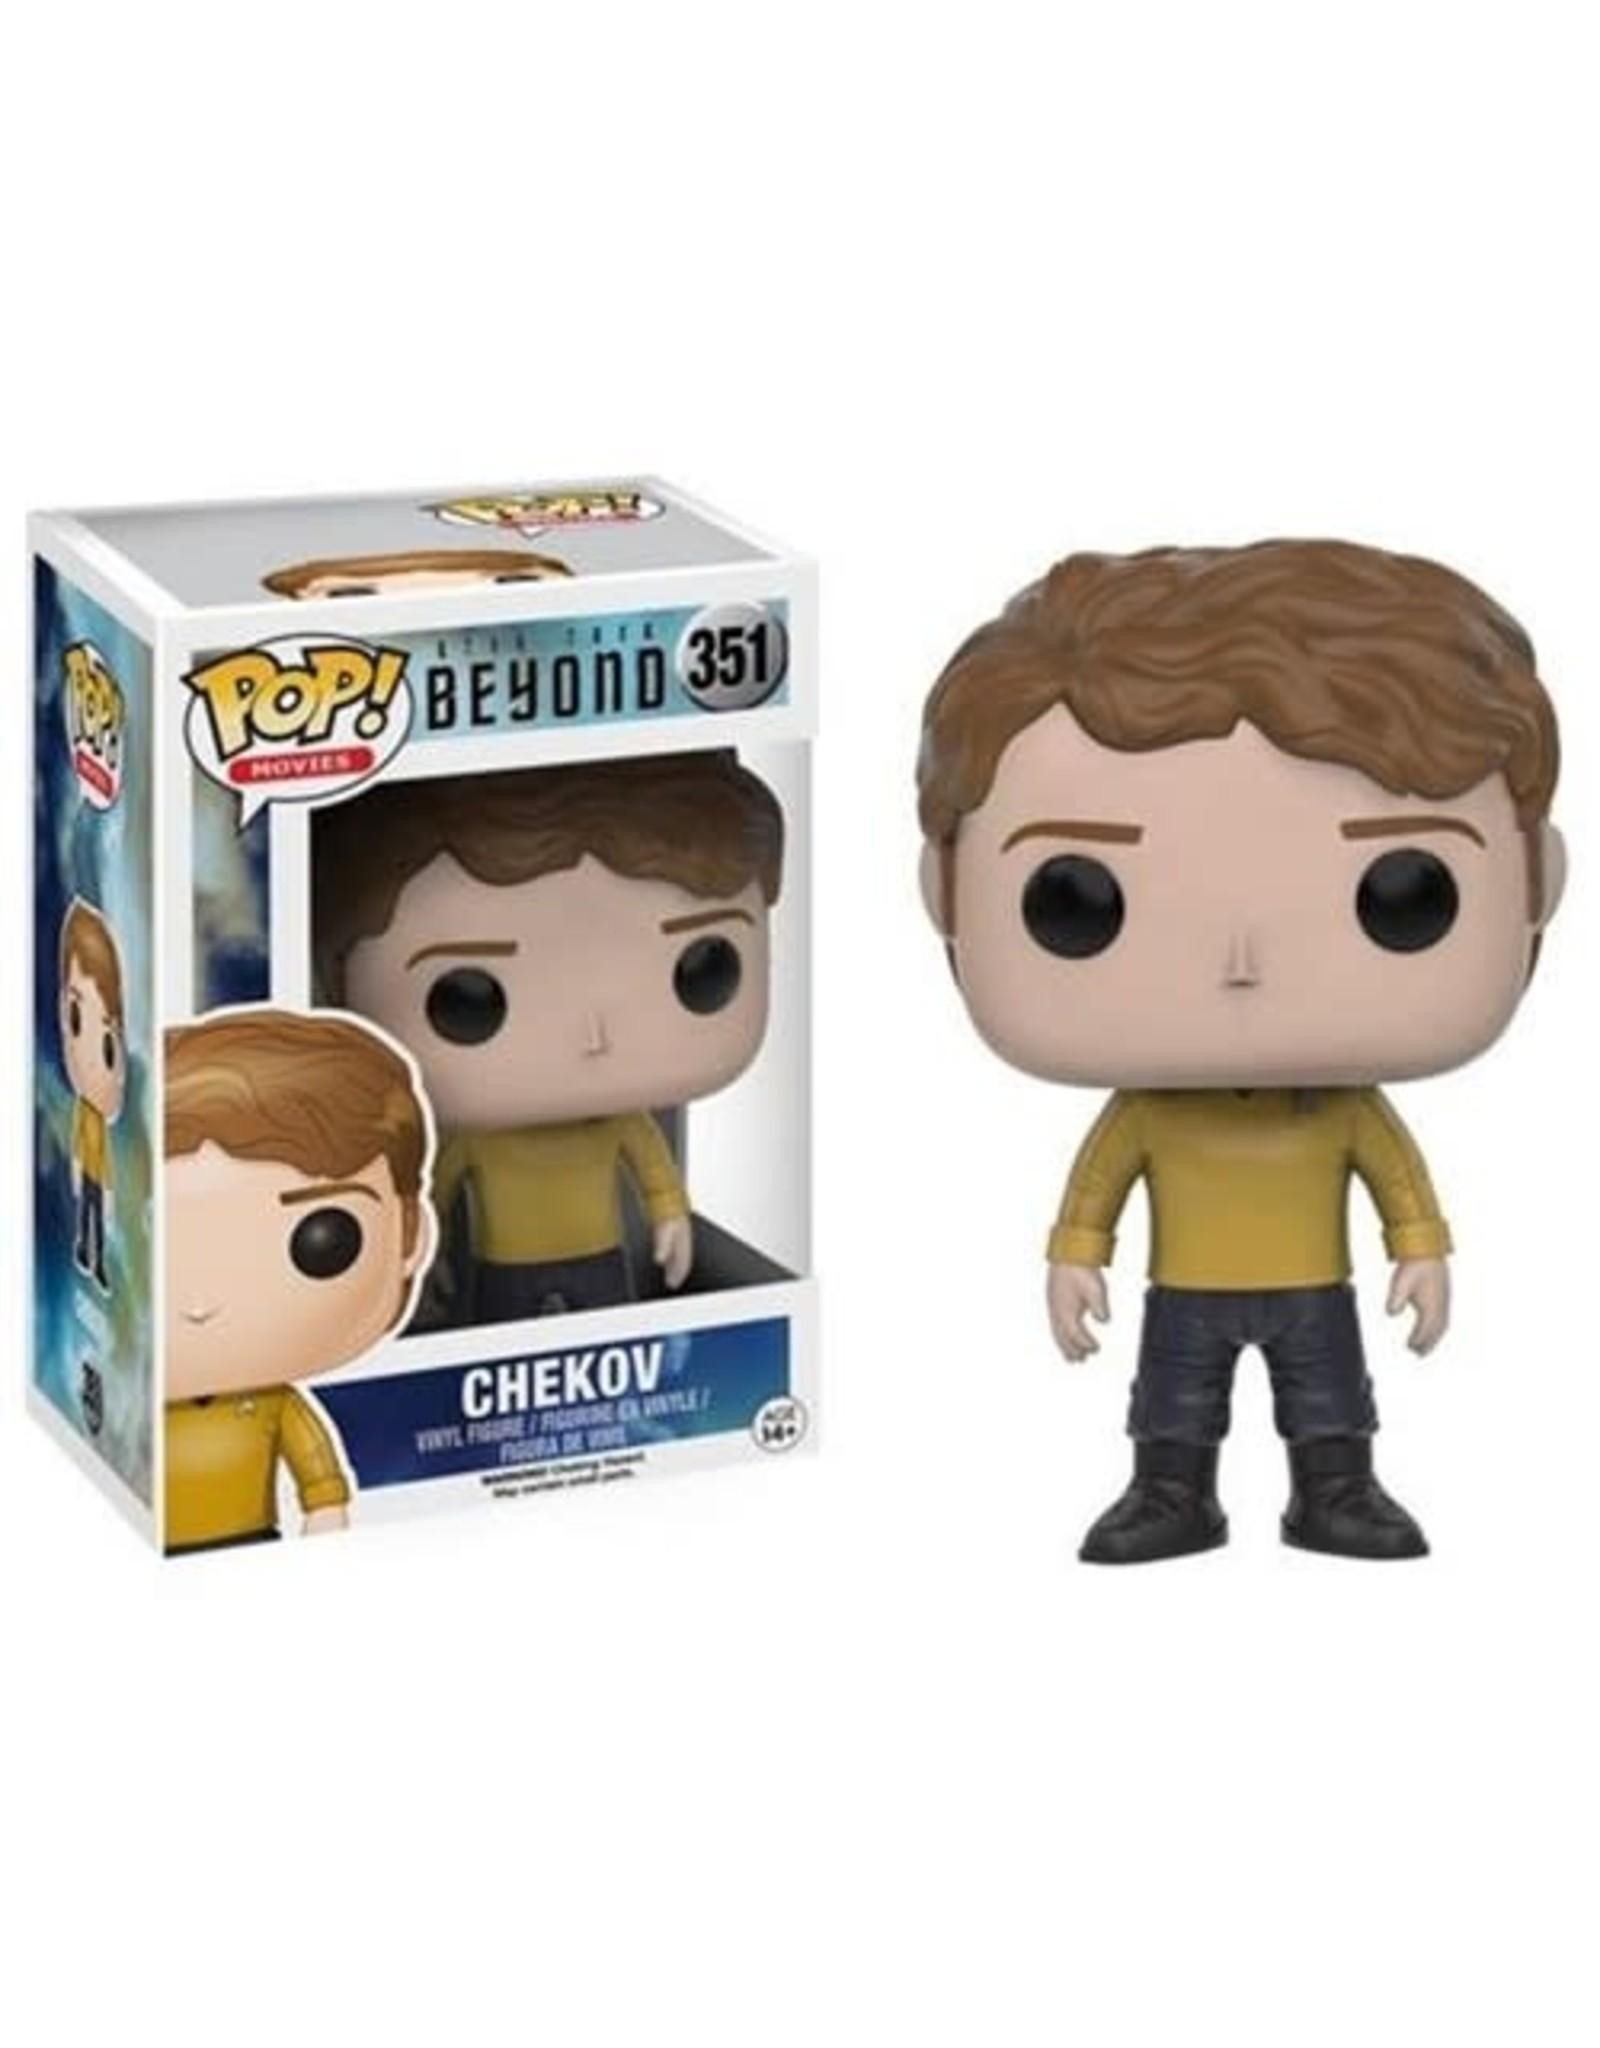 Funko Pop! Funko Pop! Movies nr351 Star Trek Beyond - Chekov